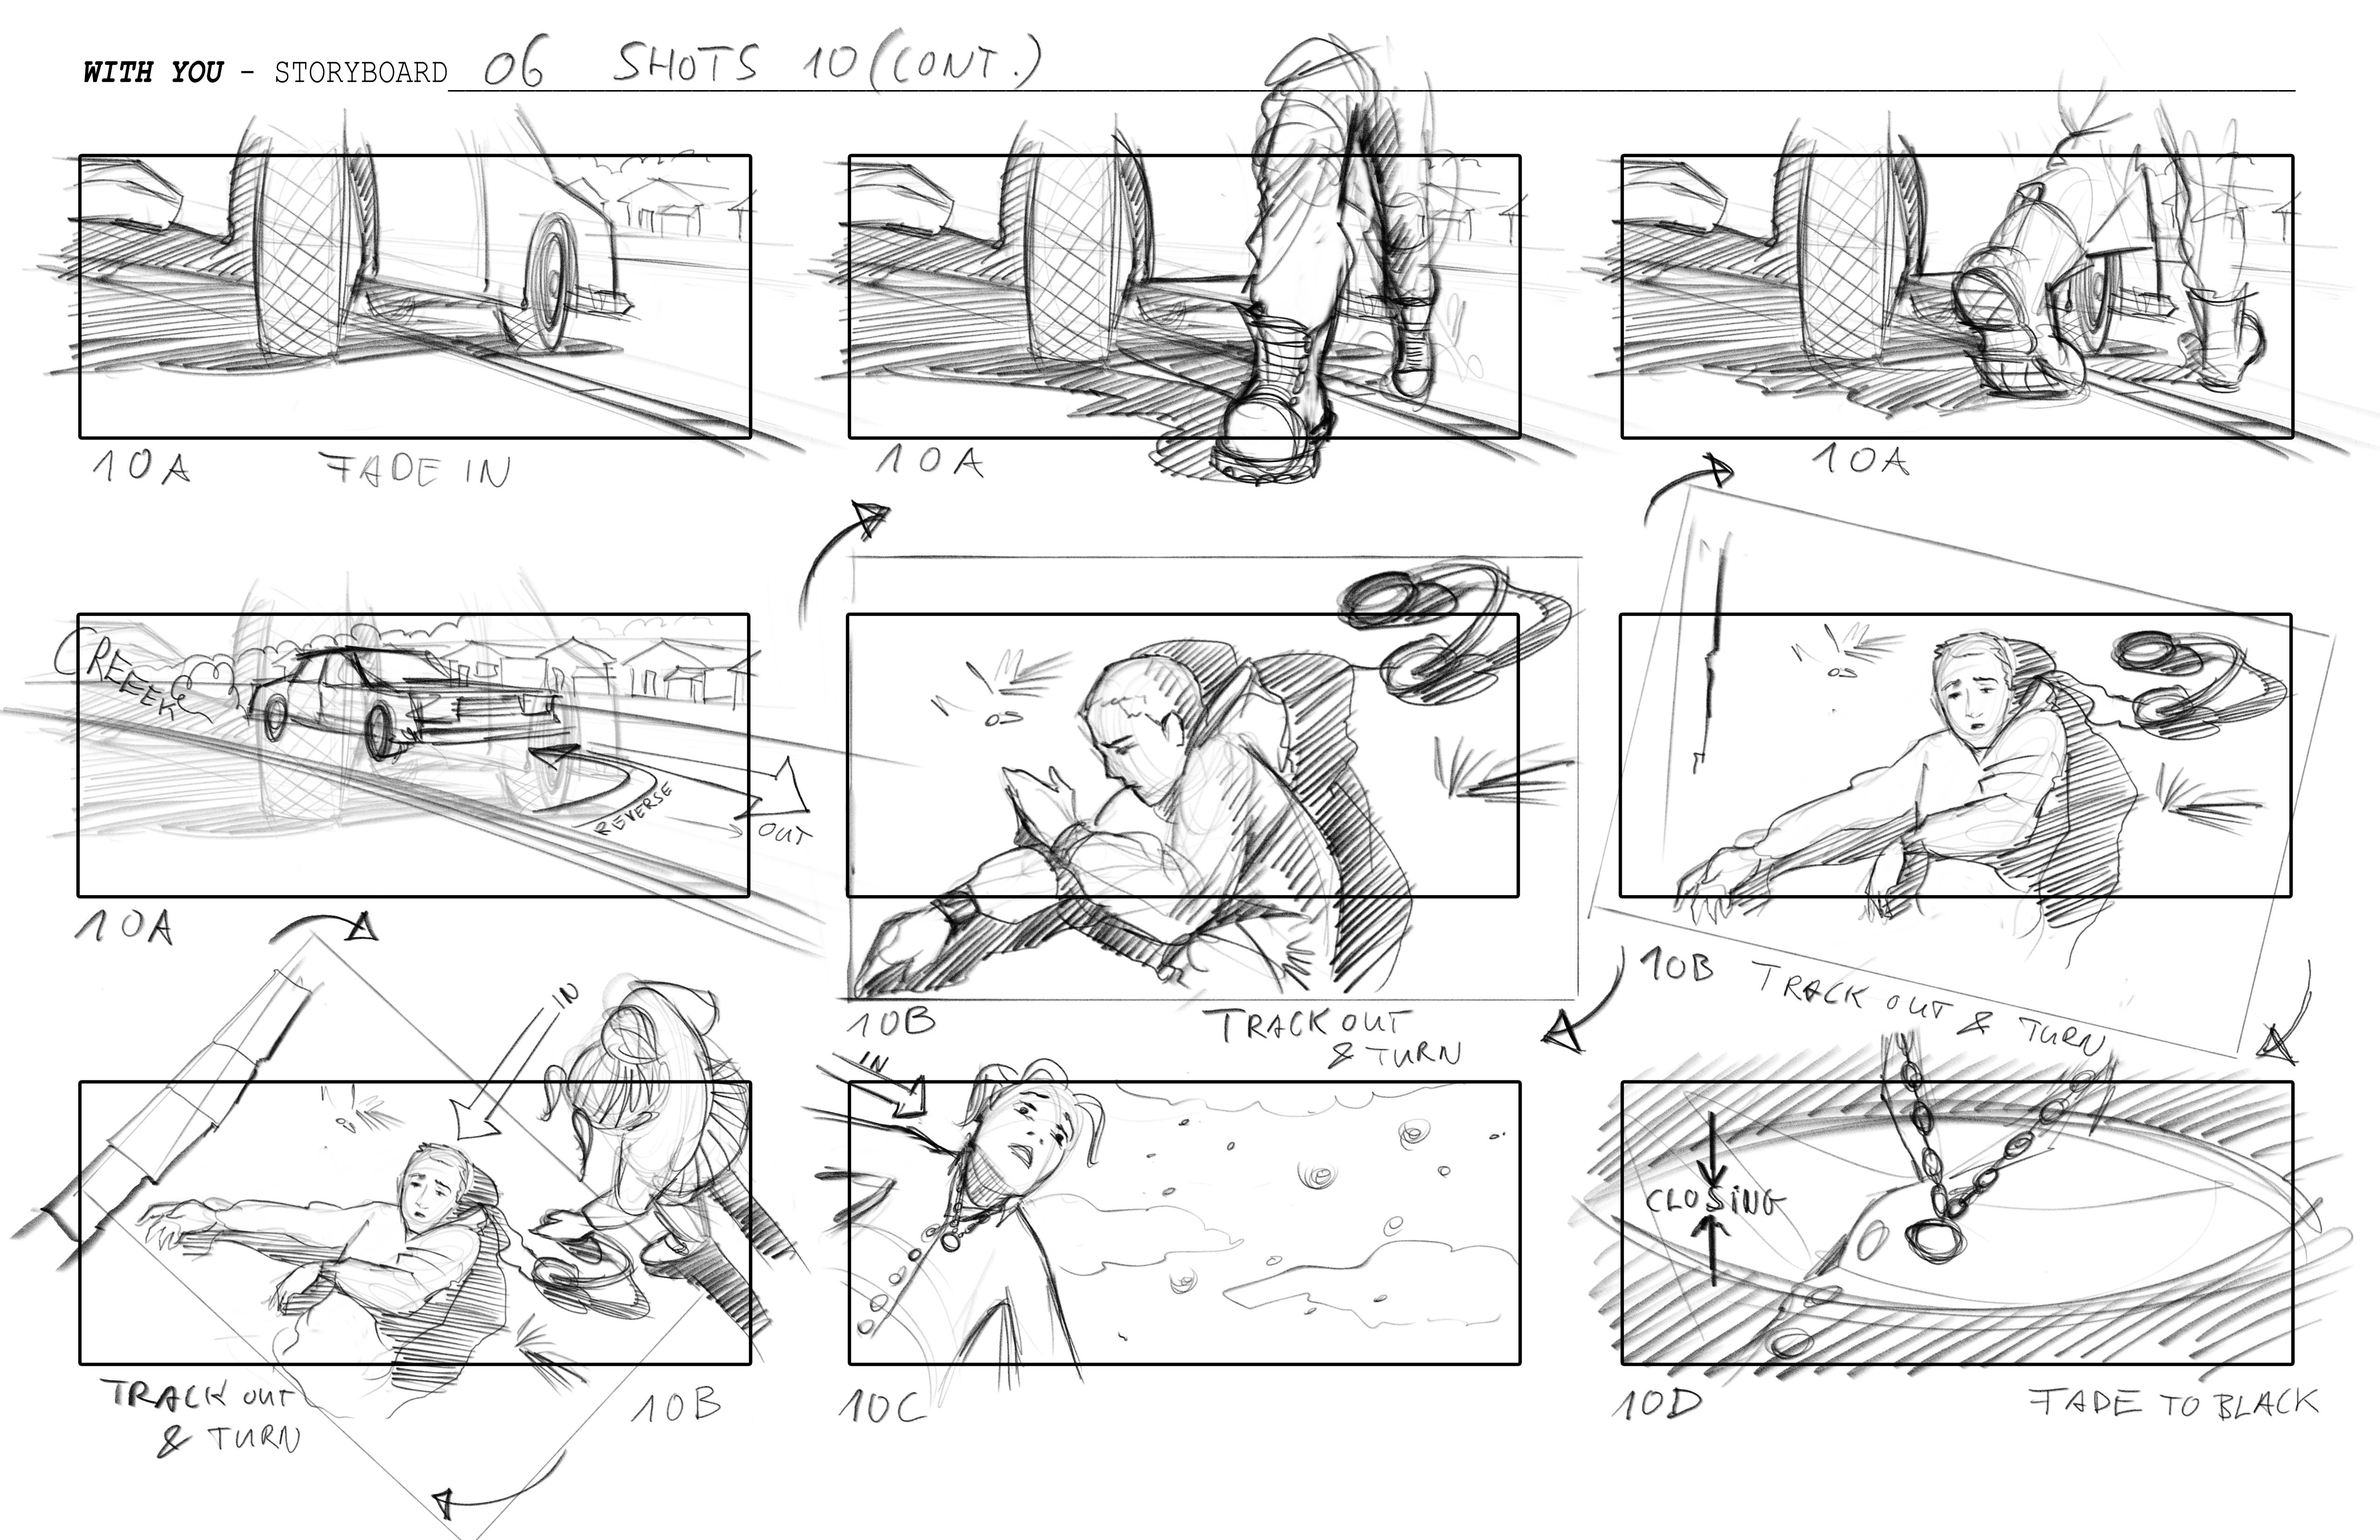 storyboard sheet 06